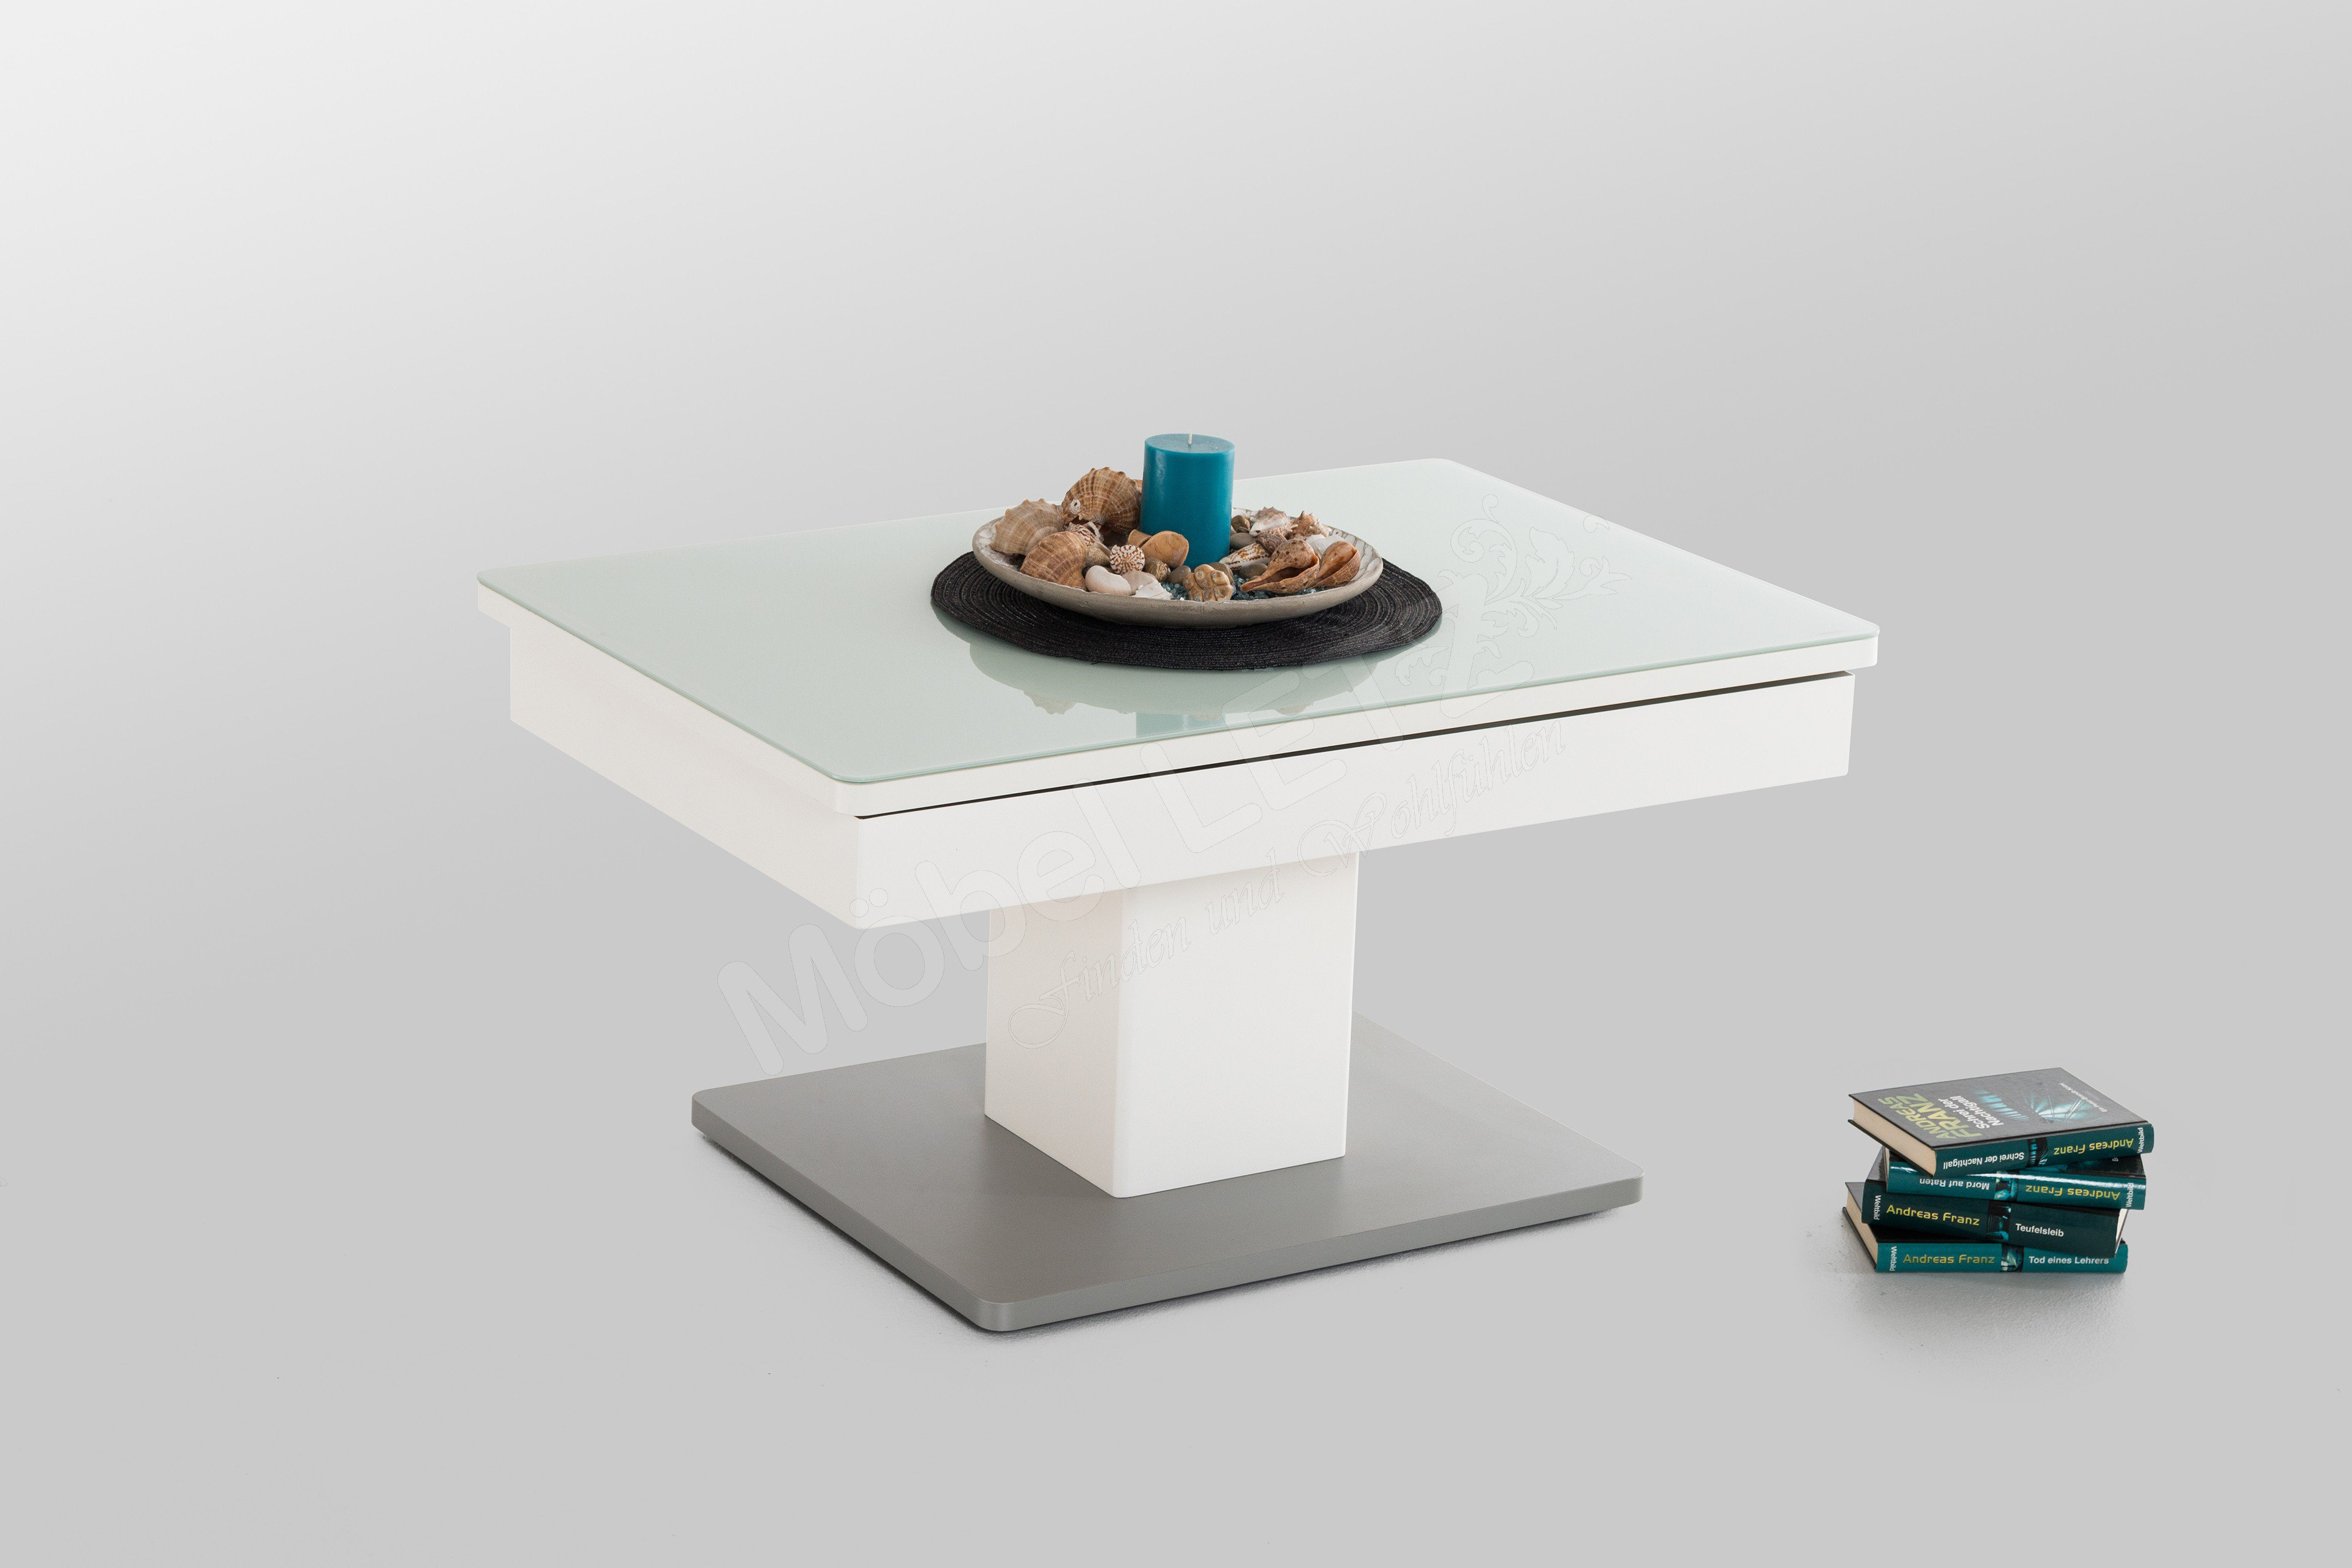 mbel online auf raten kaufen fabulous stuhl mia braun with mbel online auf raten kaufen. Black Bedroom Furniture Sets. Home Design Ideas